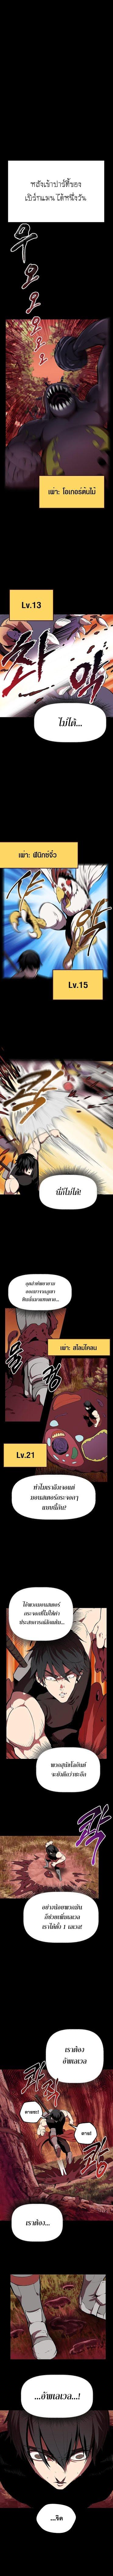 Survival of Blade King - หน้า 1